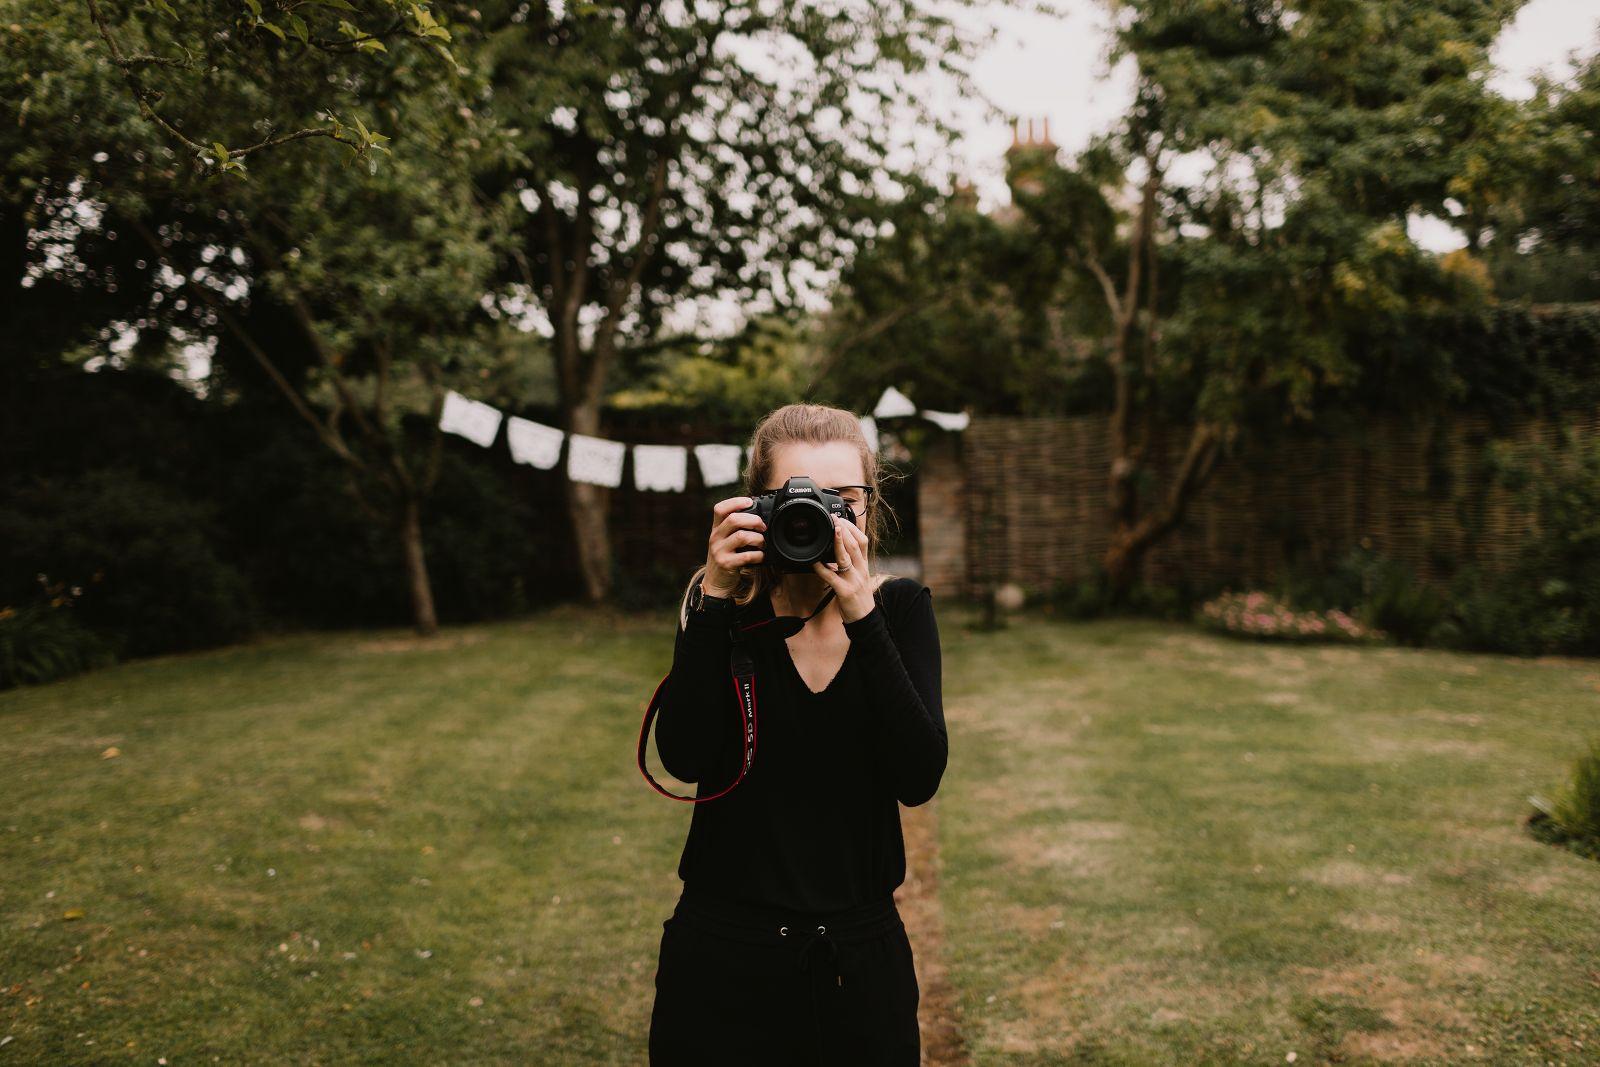 Chris Bradshaw Photography assistant Laura Bradshaw